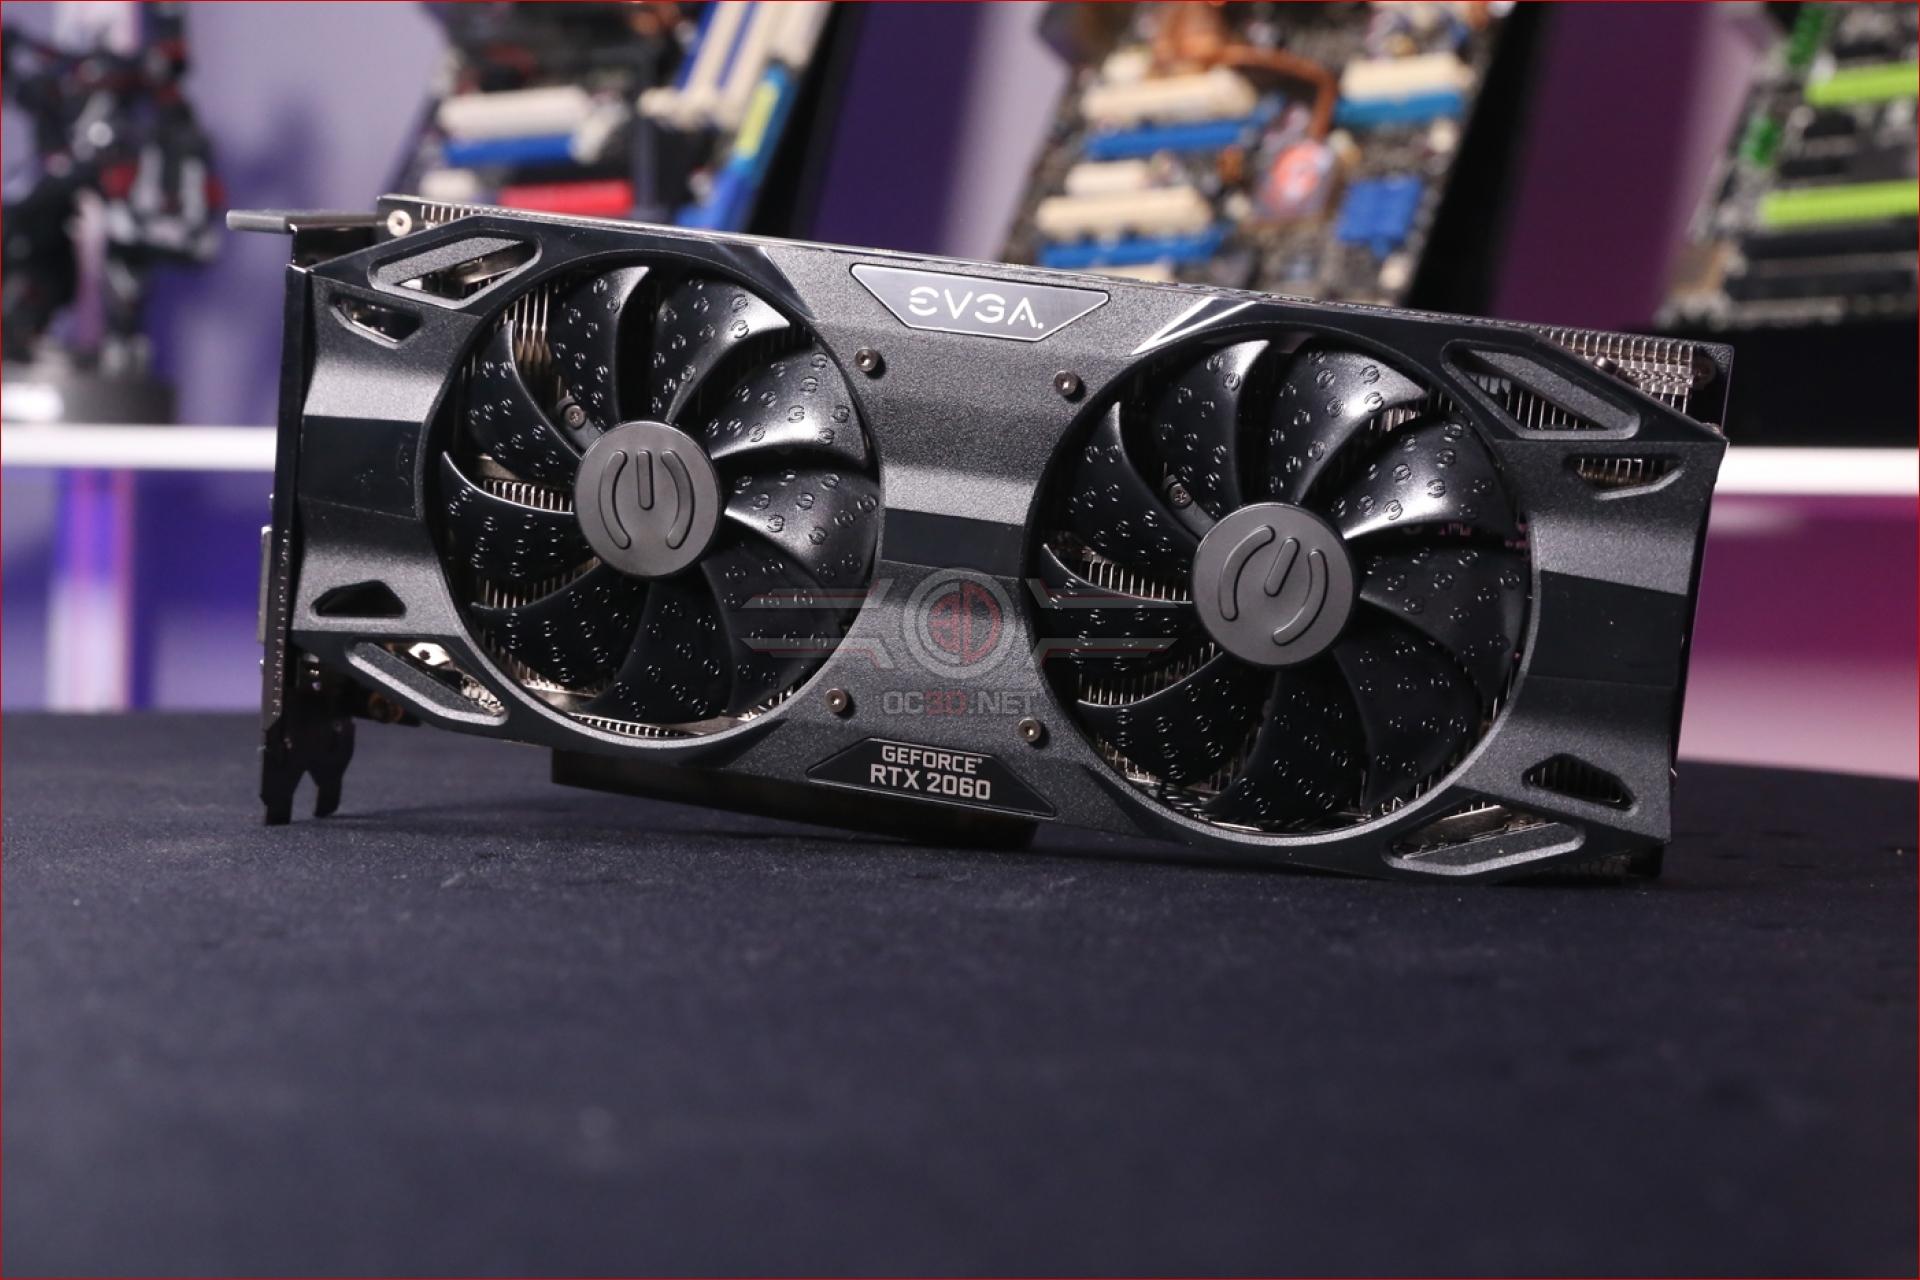 EVGA RTX 2060 XC Ultra Review | Up Close | GPU & Displays